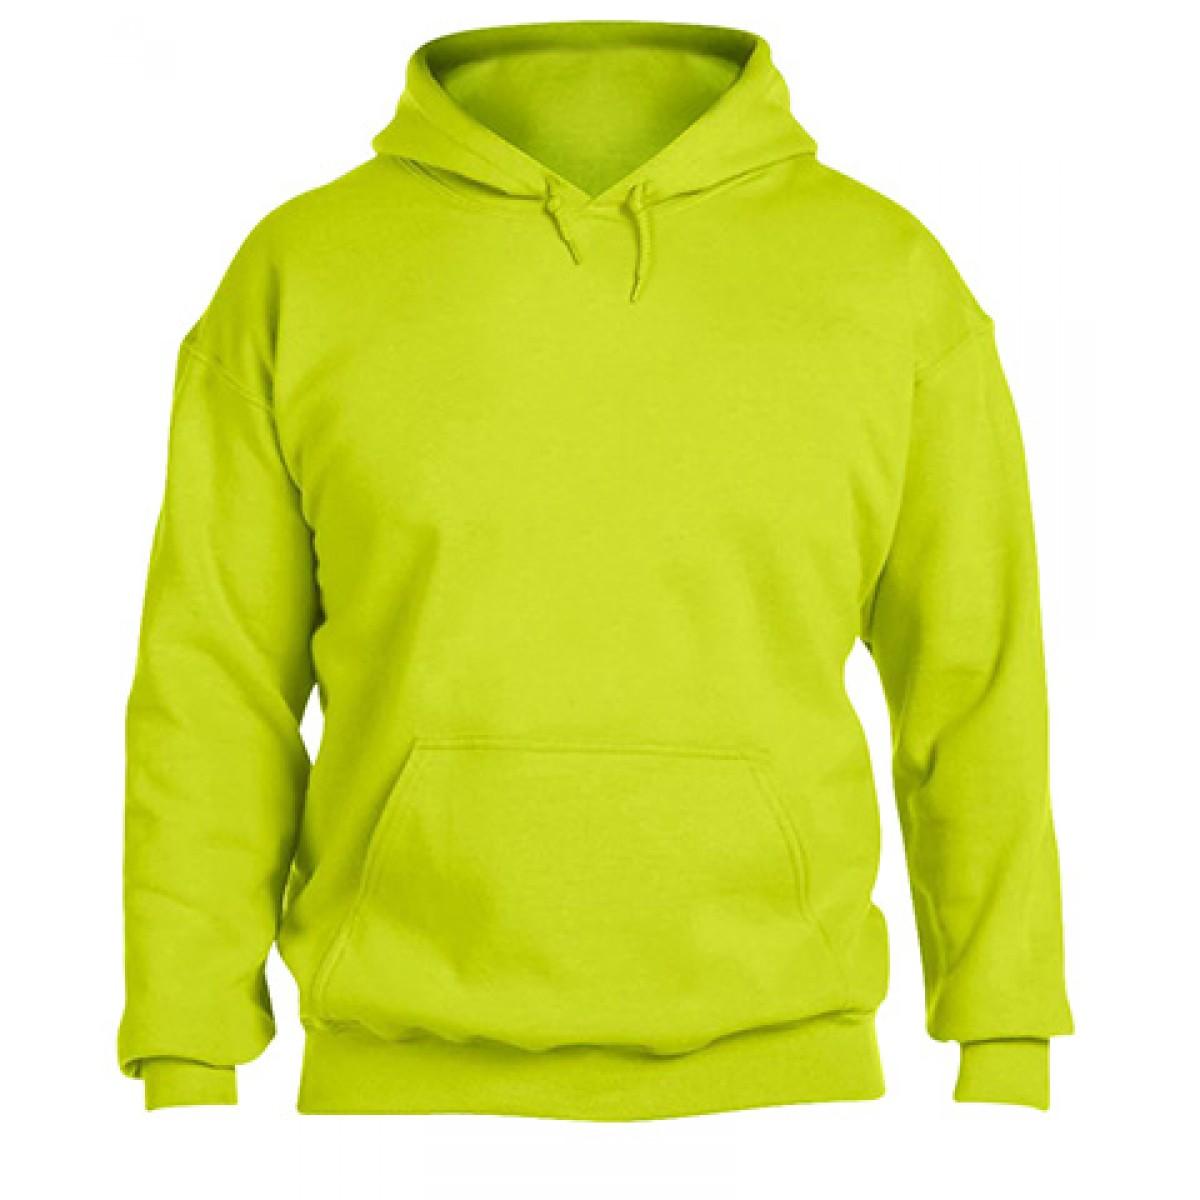 Solid Hooded Sweatshirt  50/50 Heavy Blend-Neon Green-YL